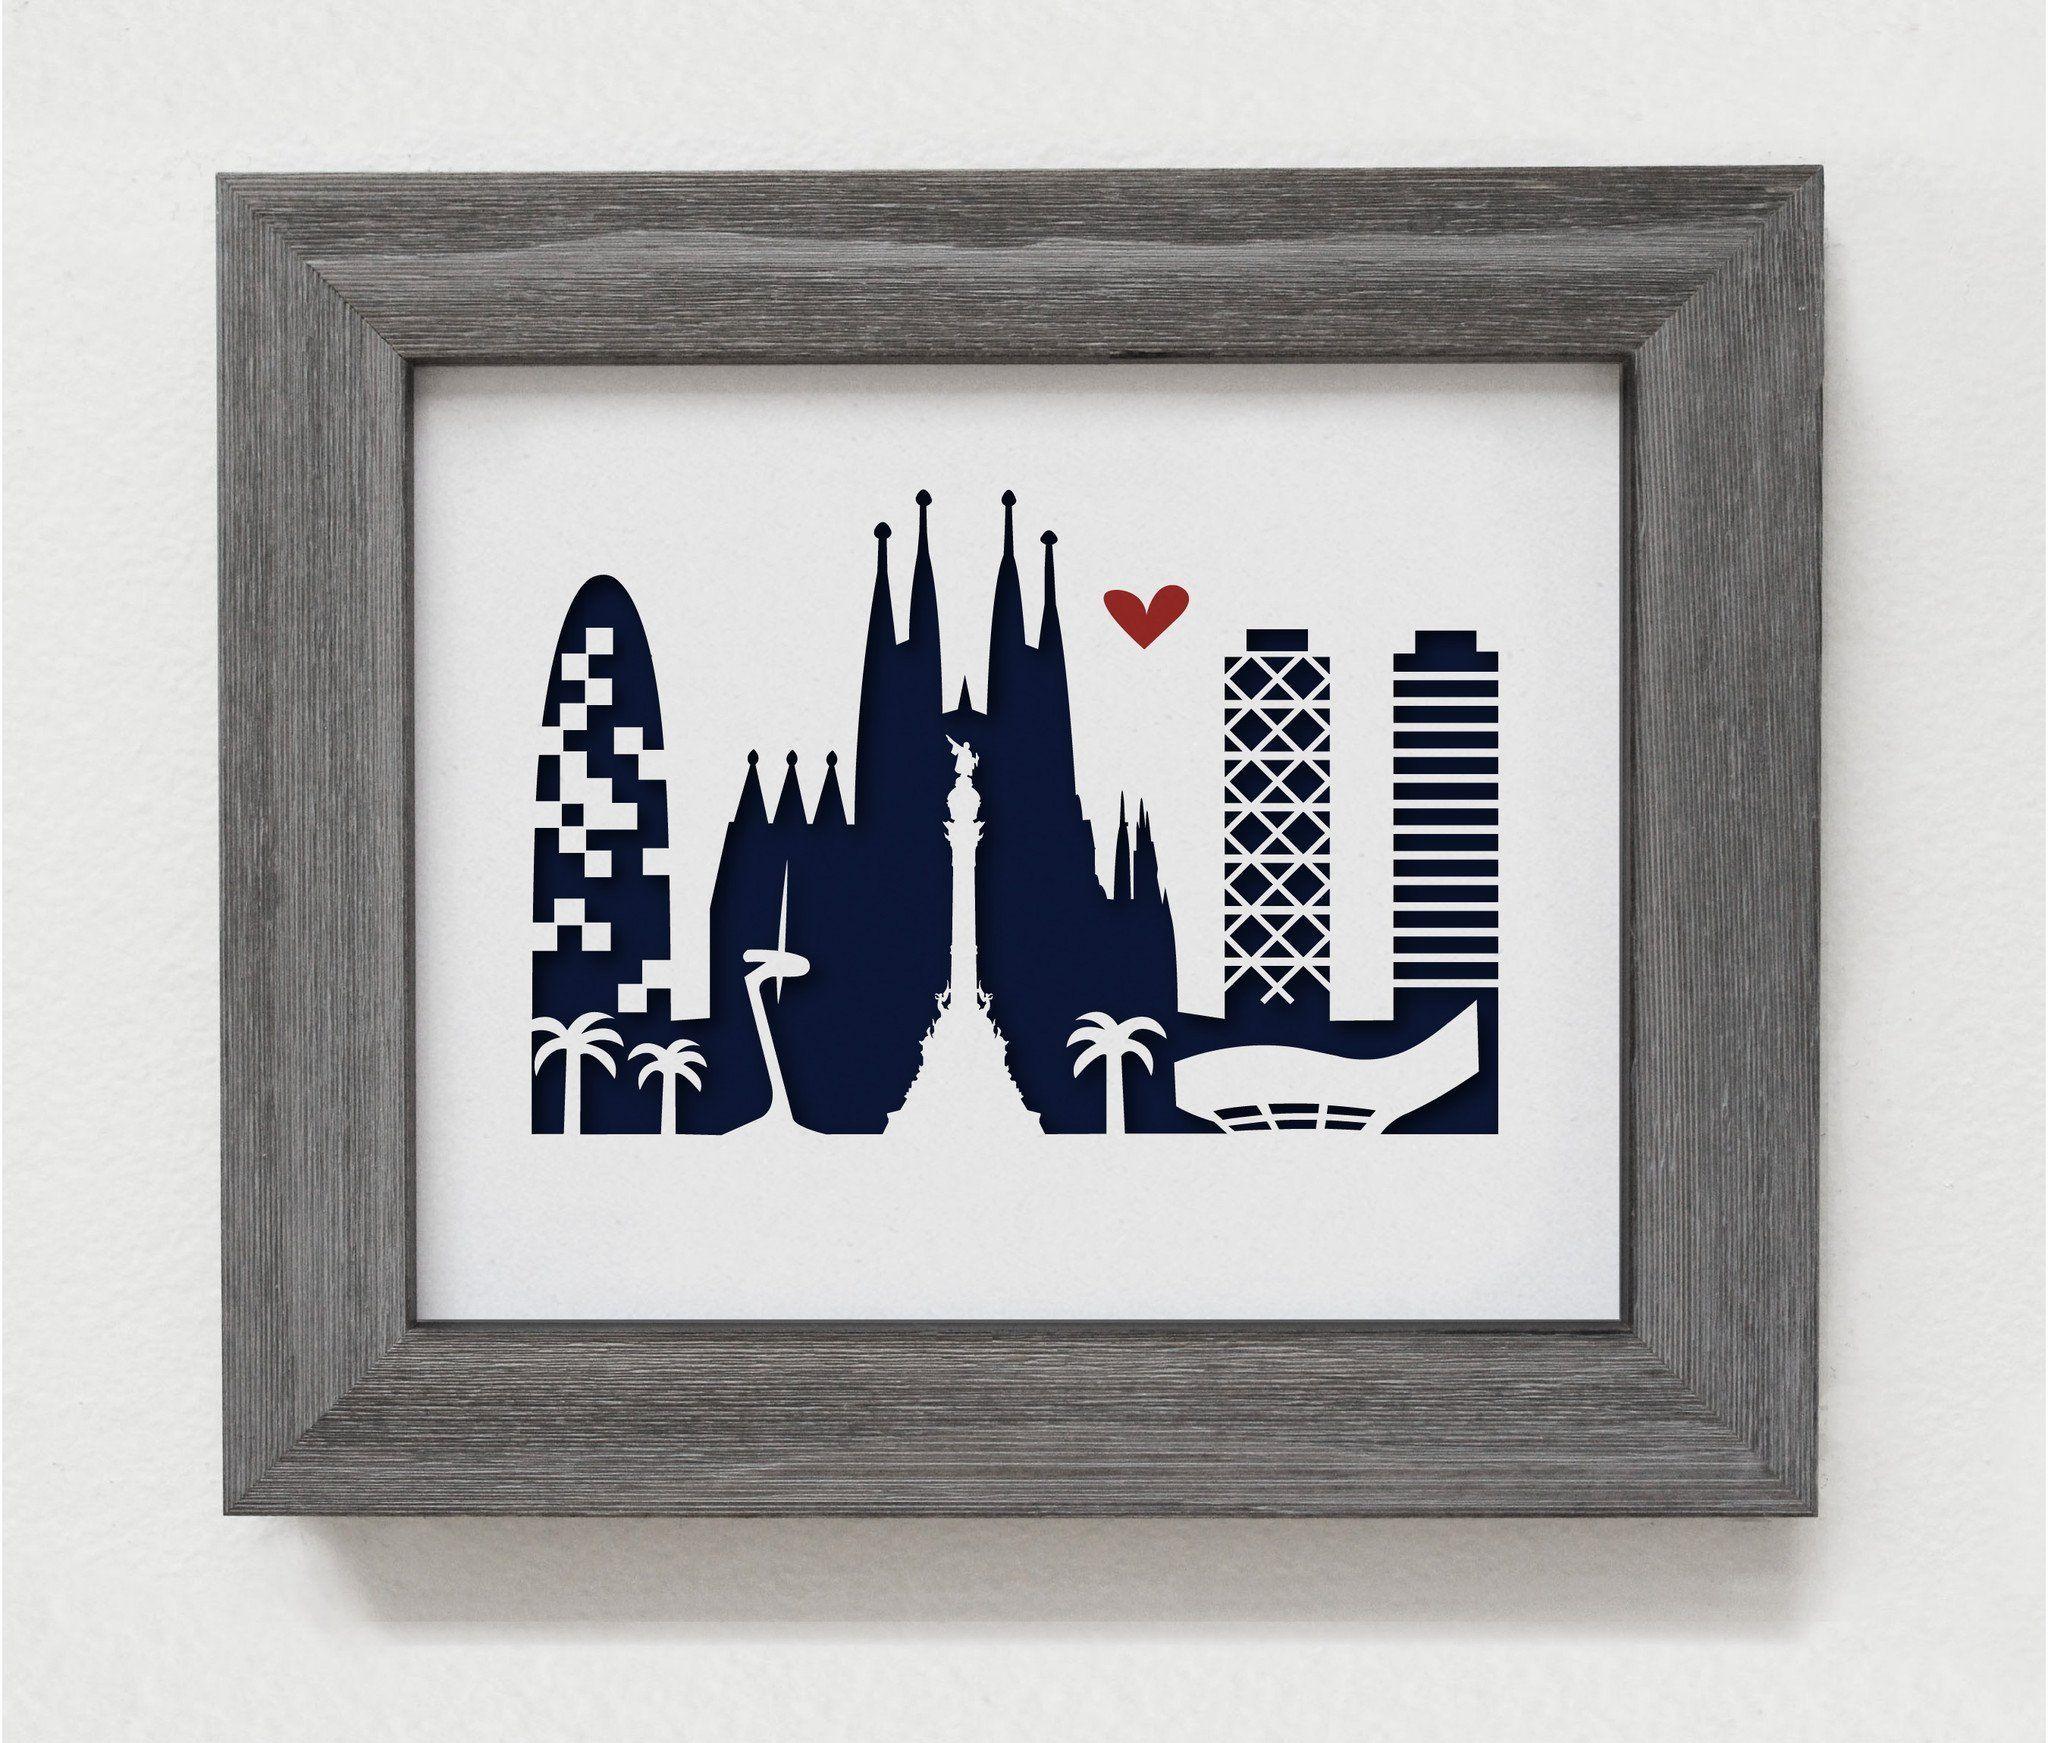 "Barcelona - 8x10"" Papercut Artwork"